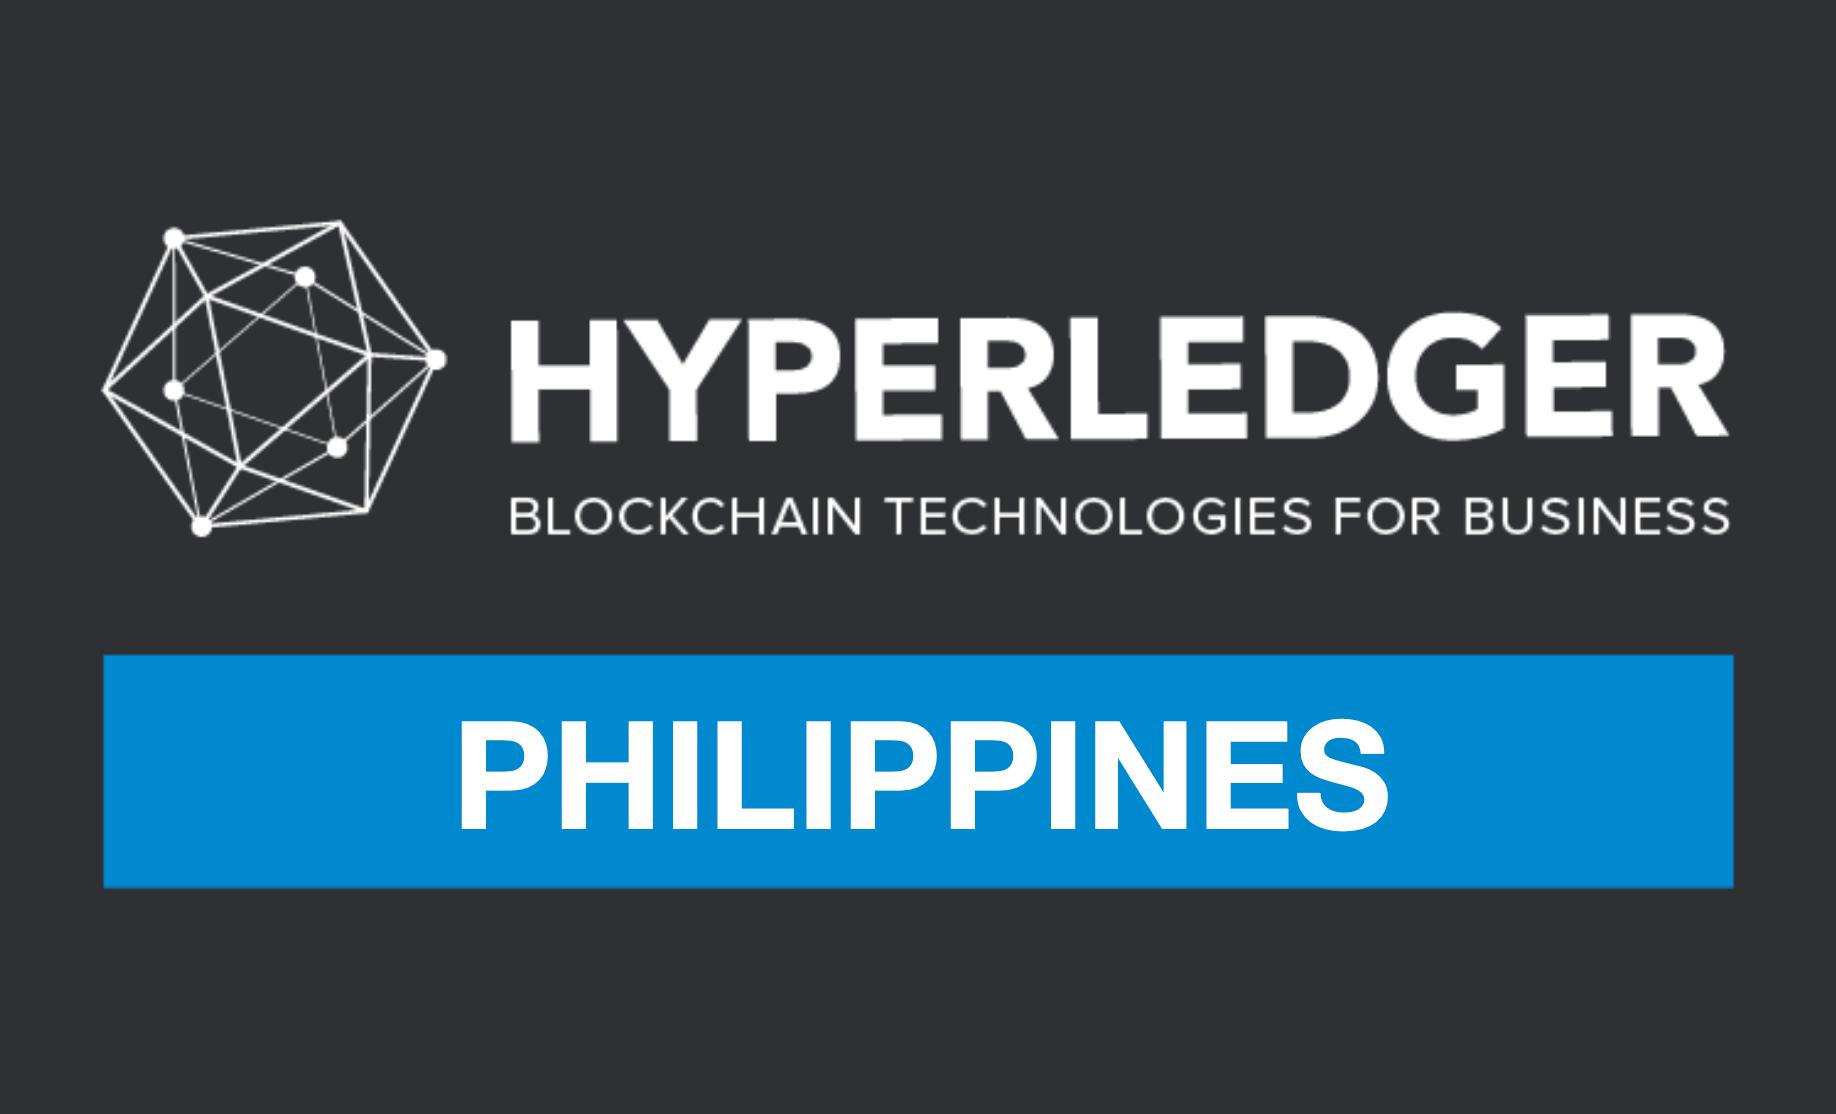 Hyperledger Philippines